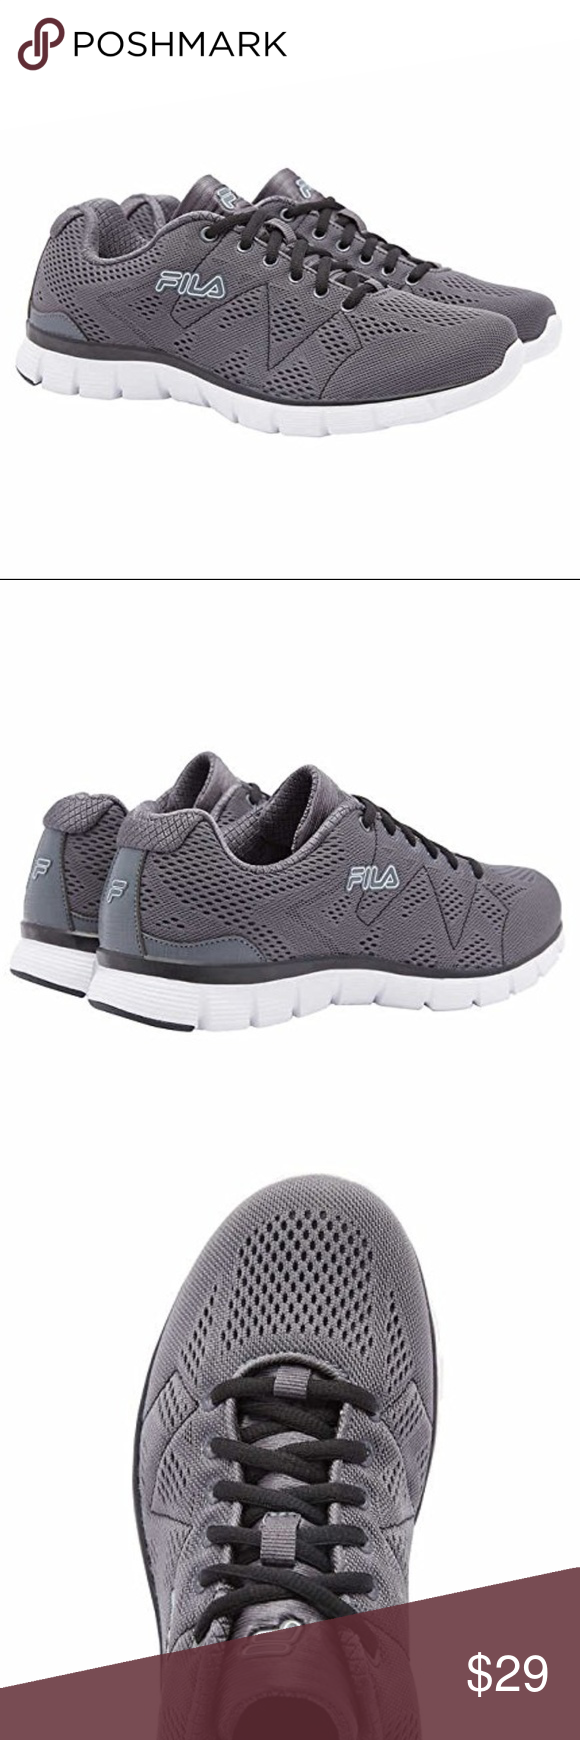 c5c8825f038e Fila Men s Athletic Shoe Memory Memory Foam Gray Fila Men s Athletic Shoe Memory  refractive Foam Gray mesh Imported Memory foam insole Breathable mesh upper  ...